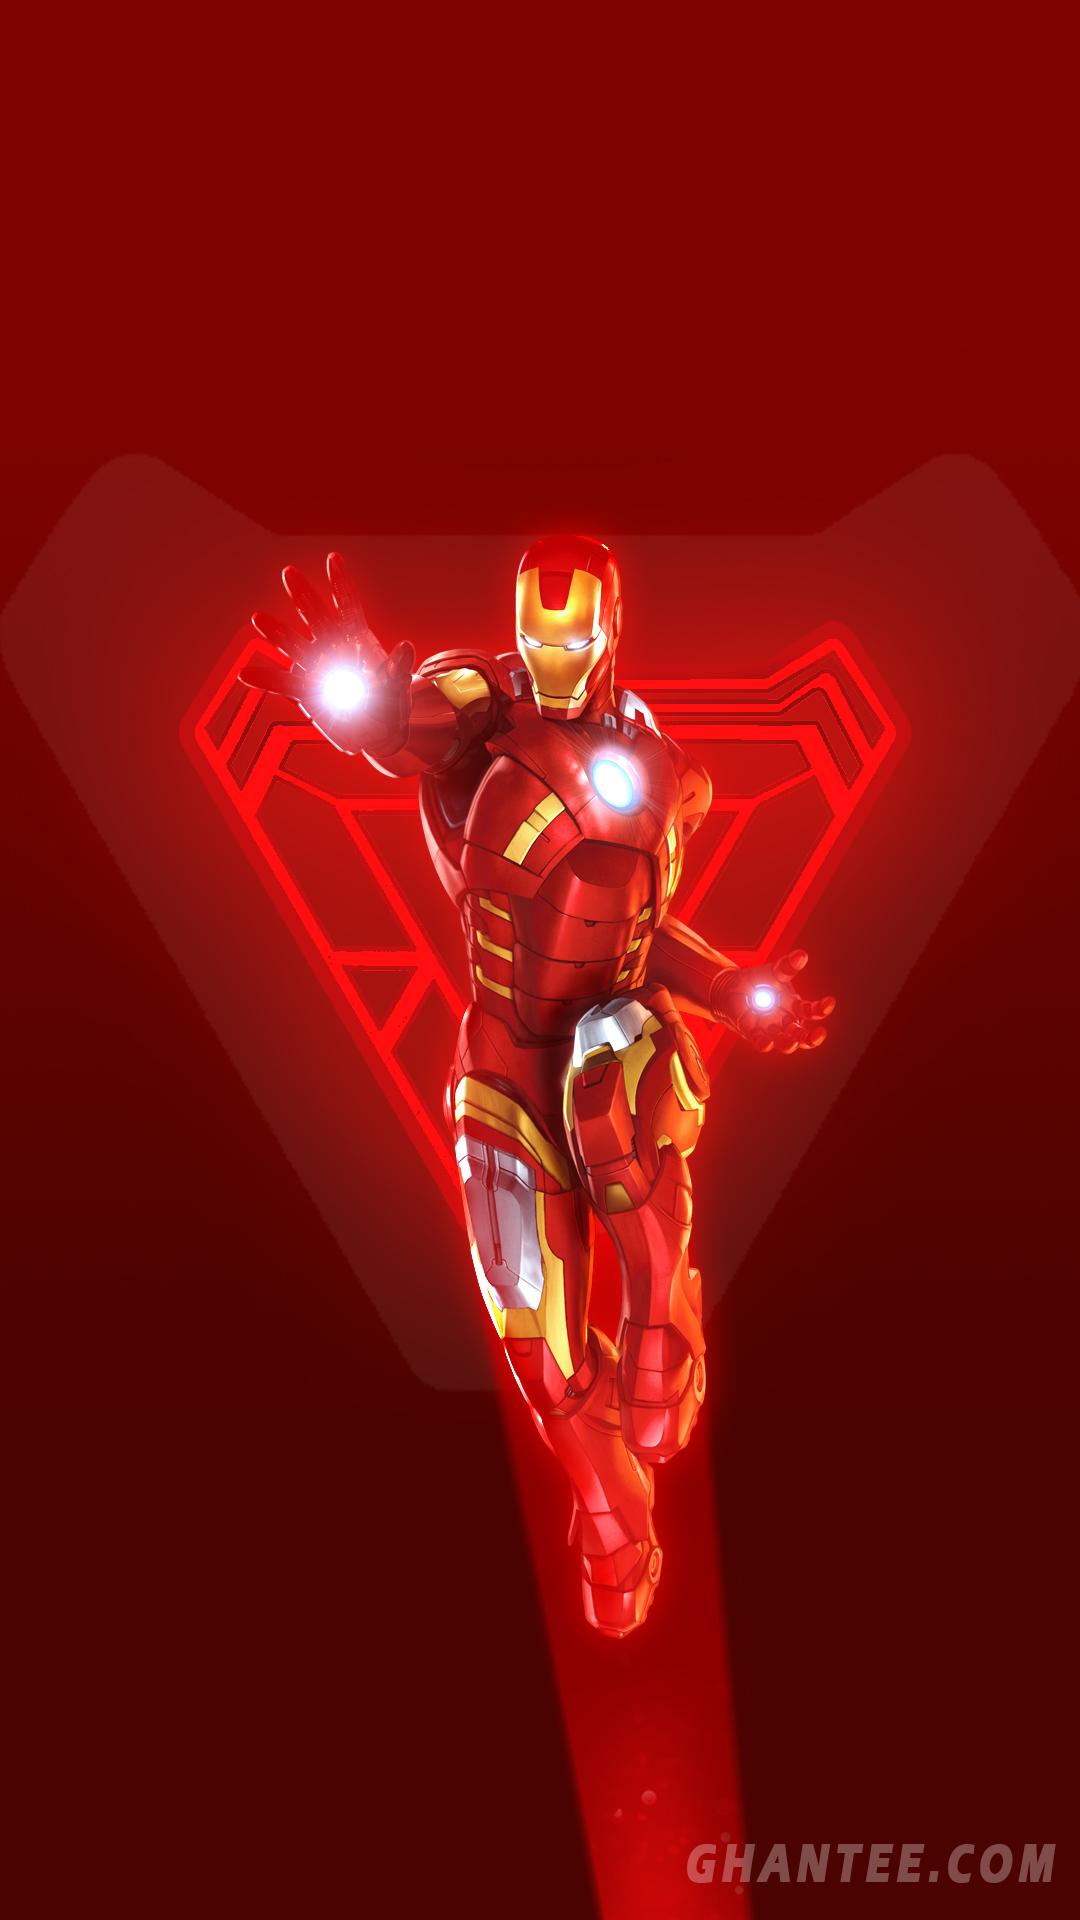 iron man hd phone wallpaper red | full hd